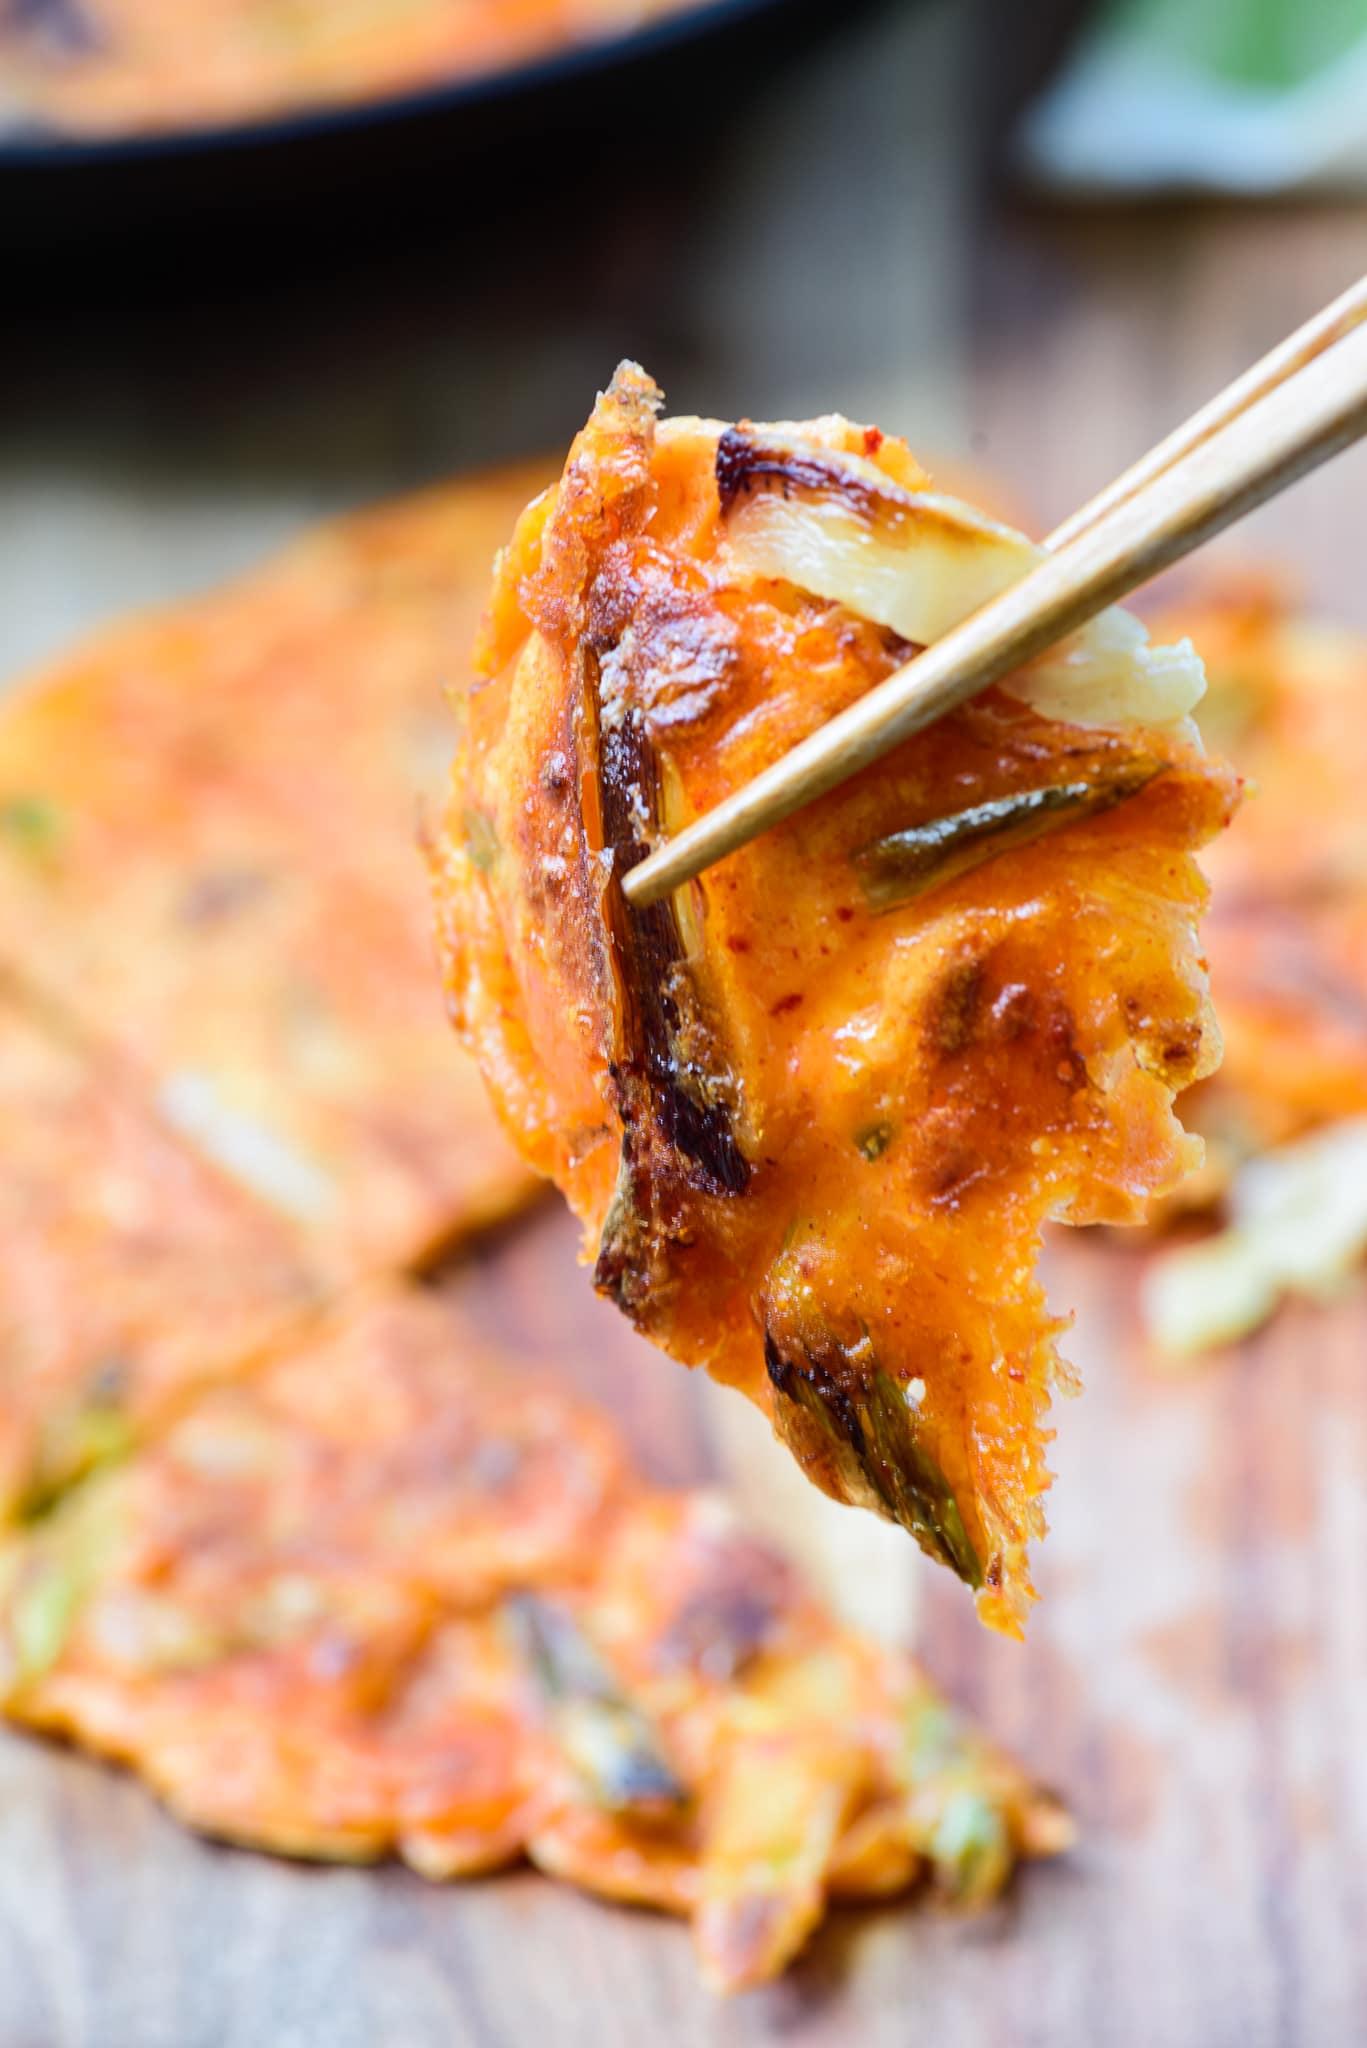 DSC0836 01 2 - Kimchijeon (Kimchi Pancake)